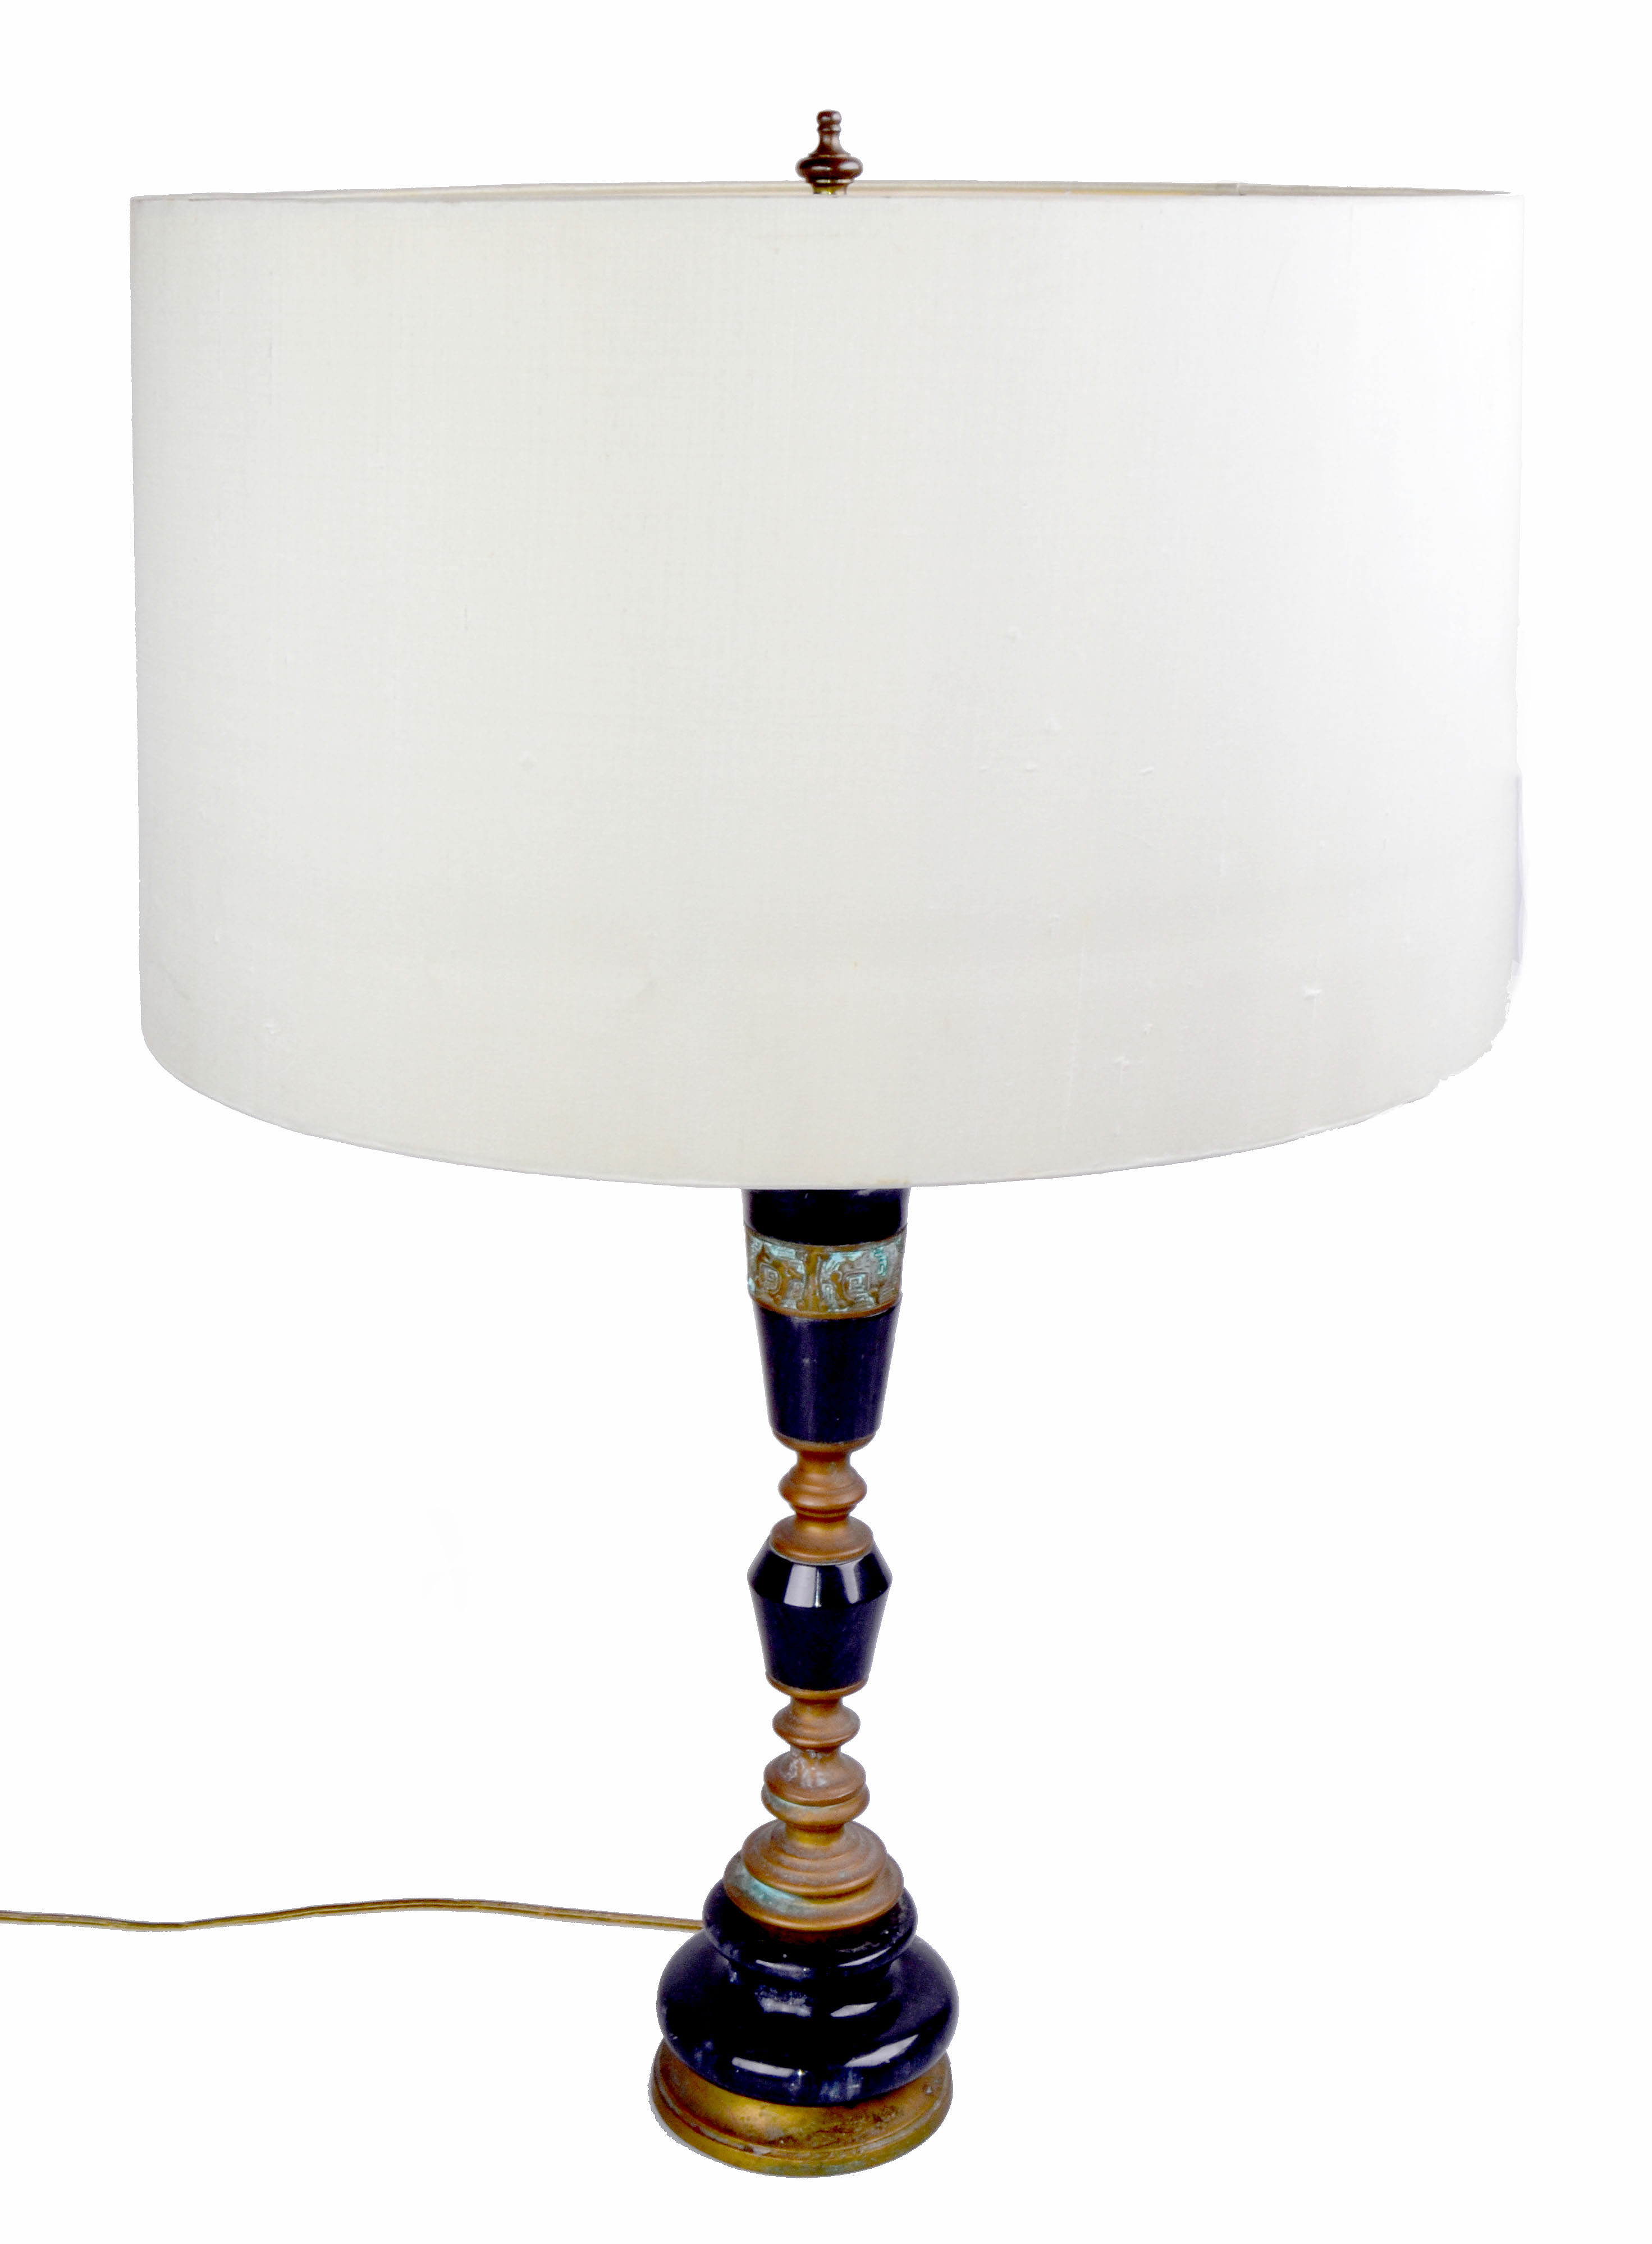 Bronze U0026 Black Marble Table Lamp   Image 2 Of 10